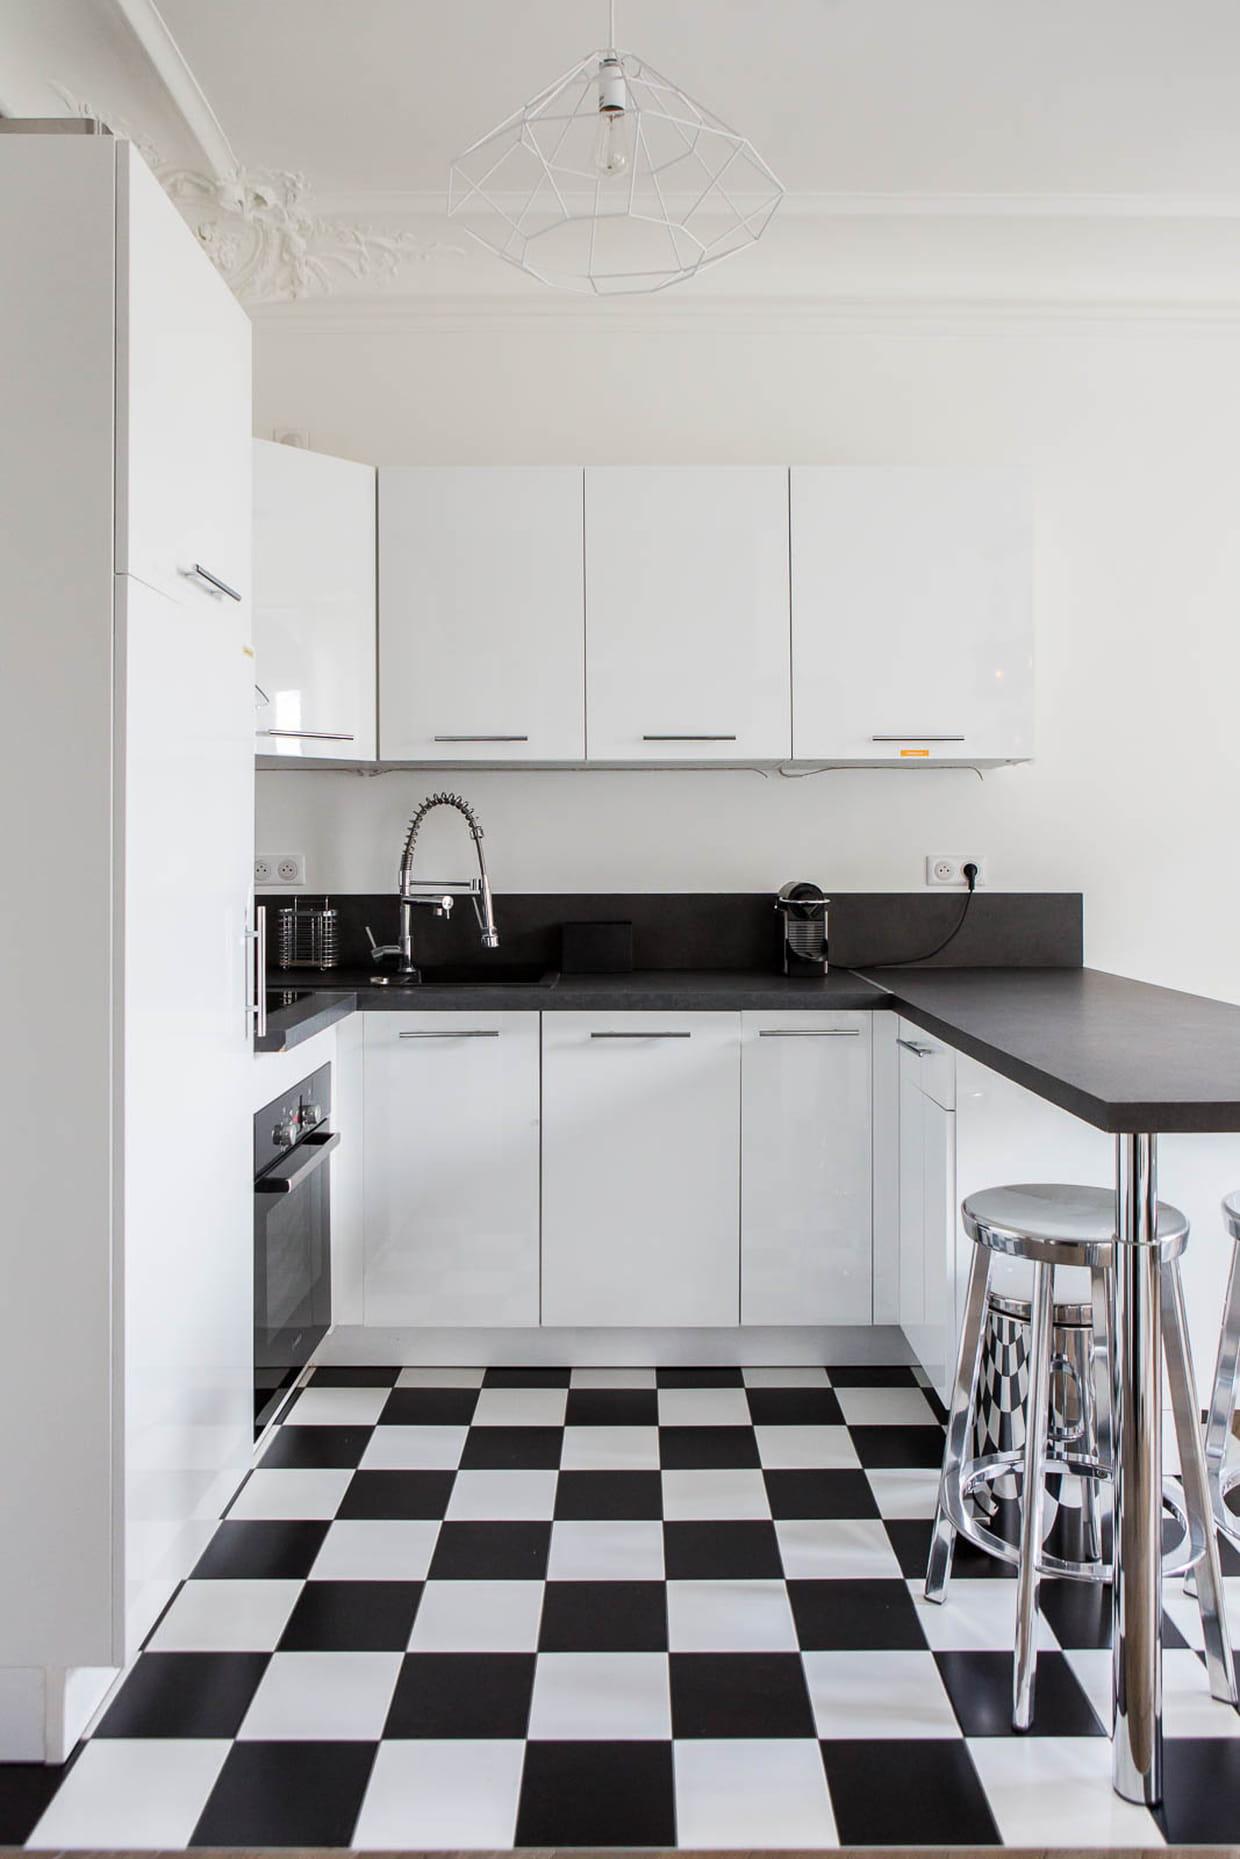 du carrelage damier noir et blanc en cuisine. Black Bedroom Furniture Sets. Home Design Ideas